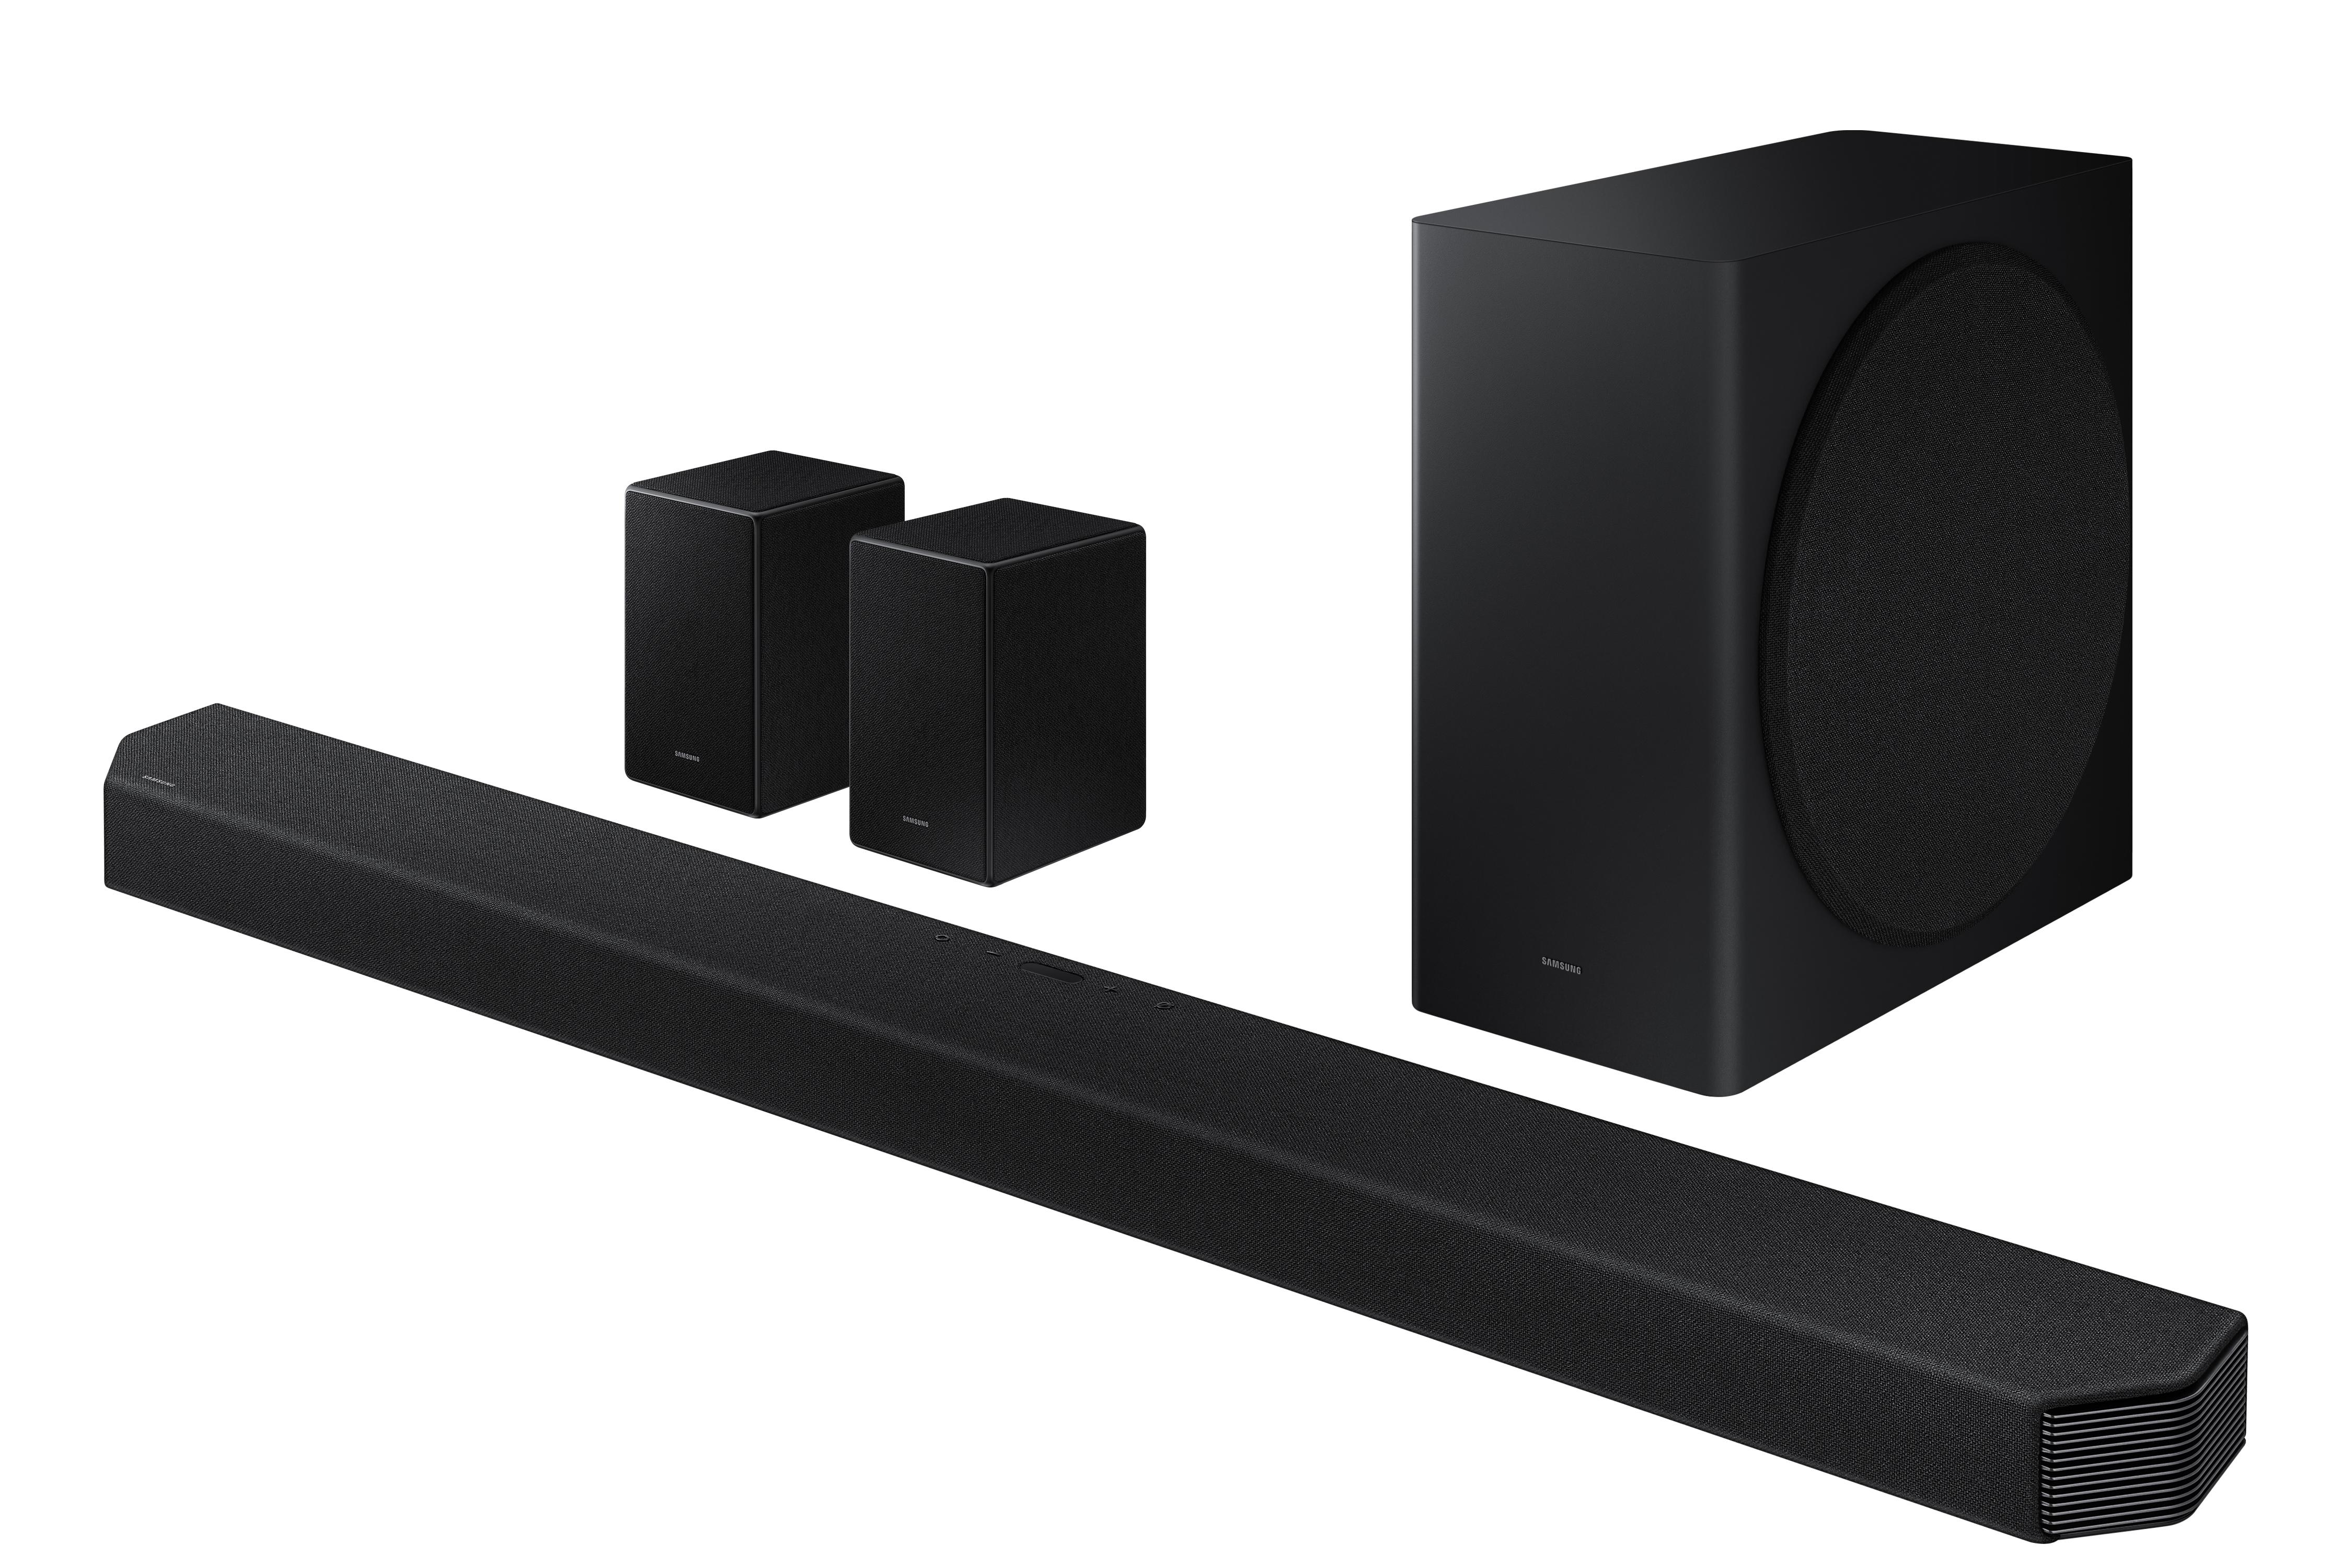 Image of HW-Q950AXU 616W 11.1.4 Bluetooth Dolby ATMOS Soundbar with Wireless Subwoofer